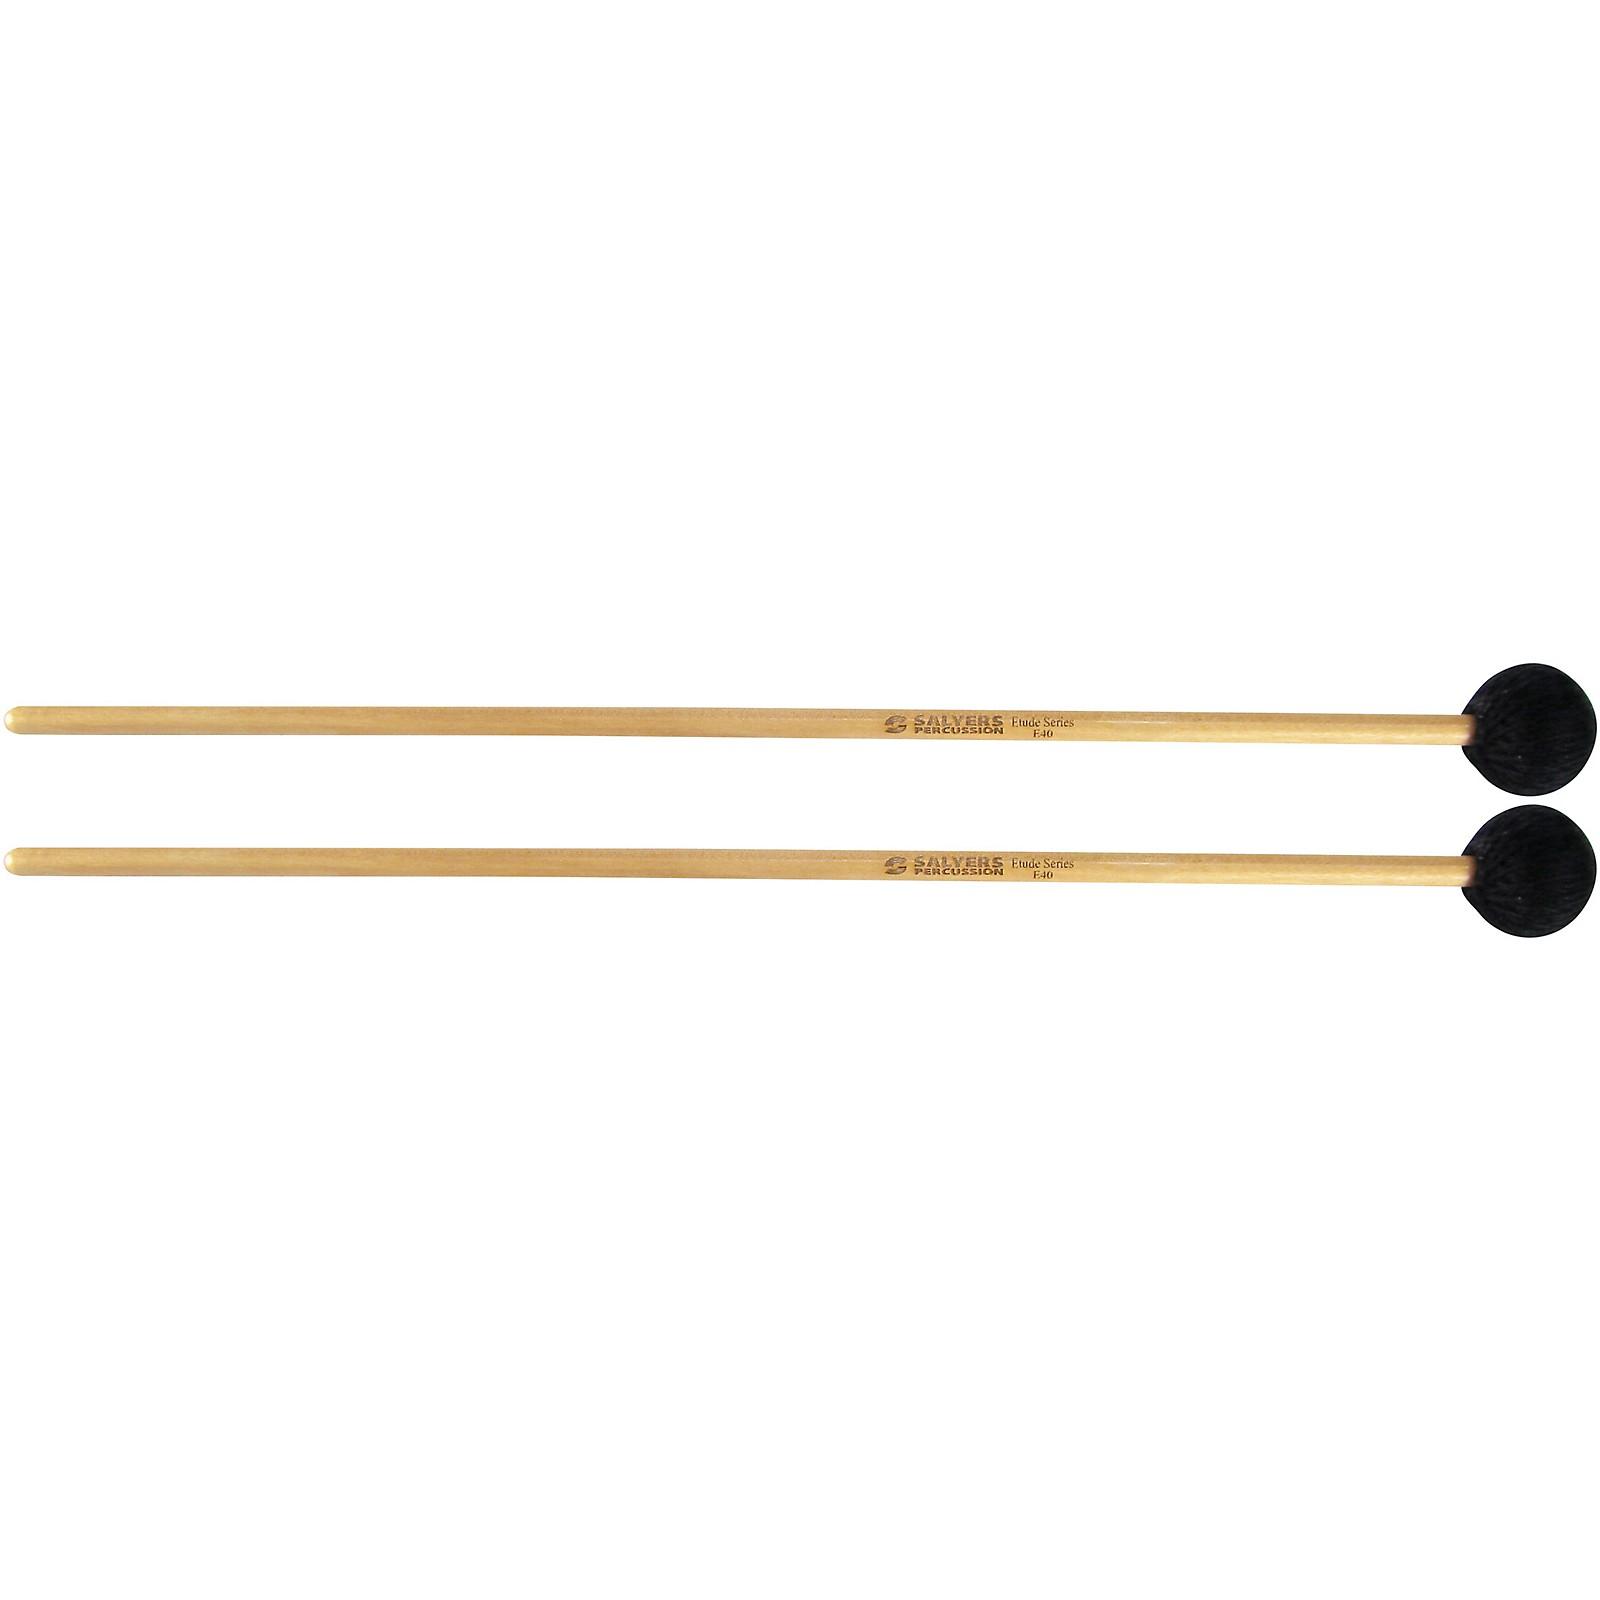 Salyers Percussion Etude Series Cord Vibraphone Mallets